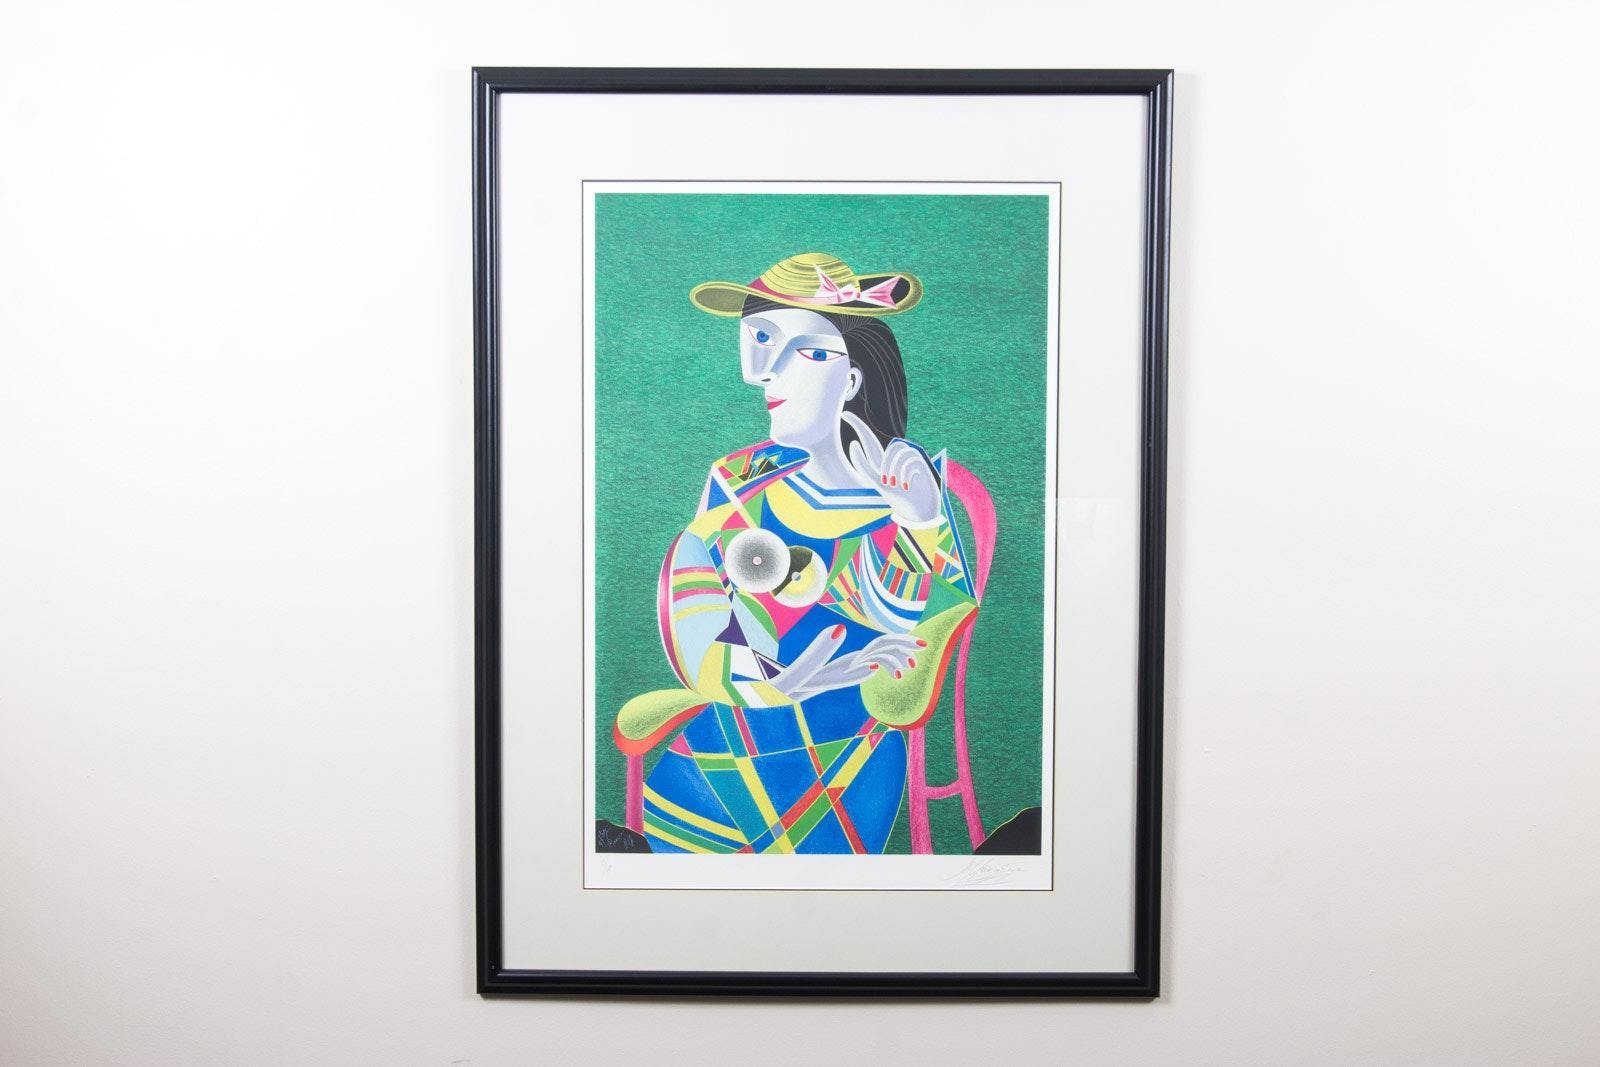 """Transformation de Picasso Suite, No. IV"" Signed Mihail Chemiakin Lithograph"